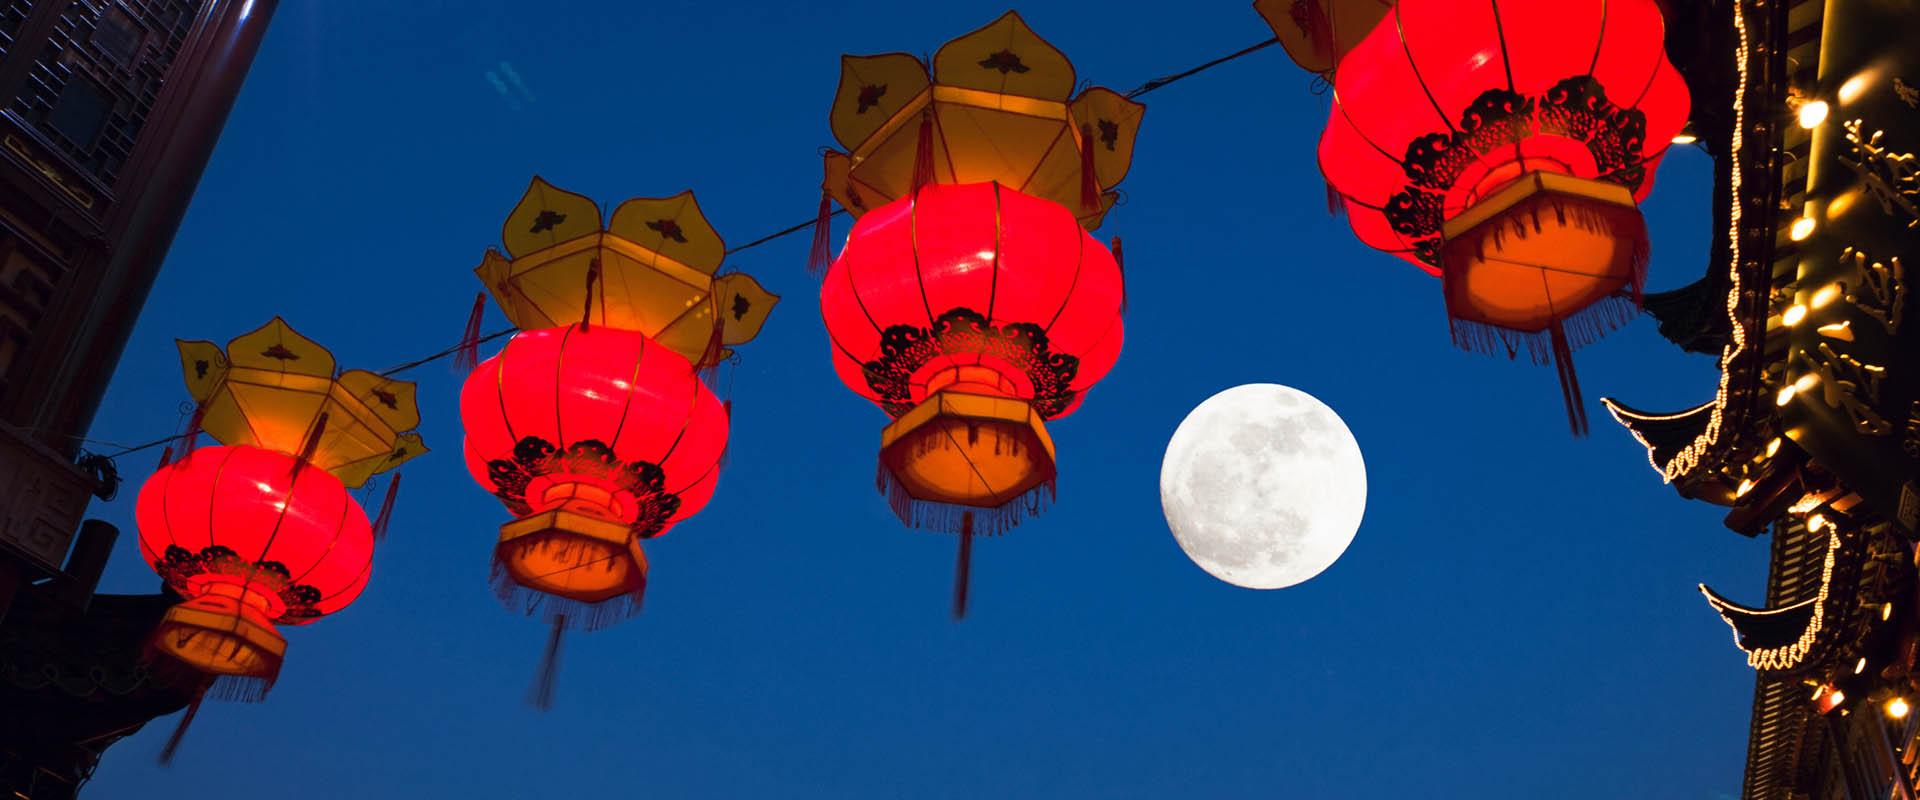 Mid Autumn Festival And Public Holidays China